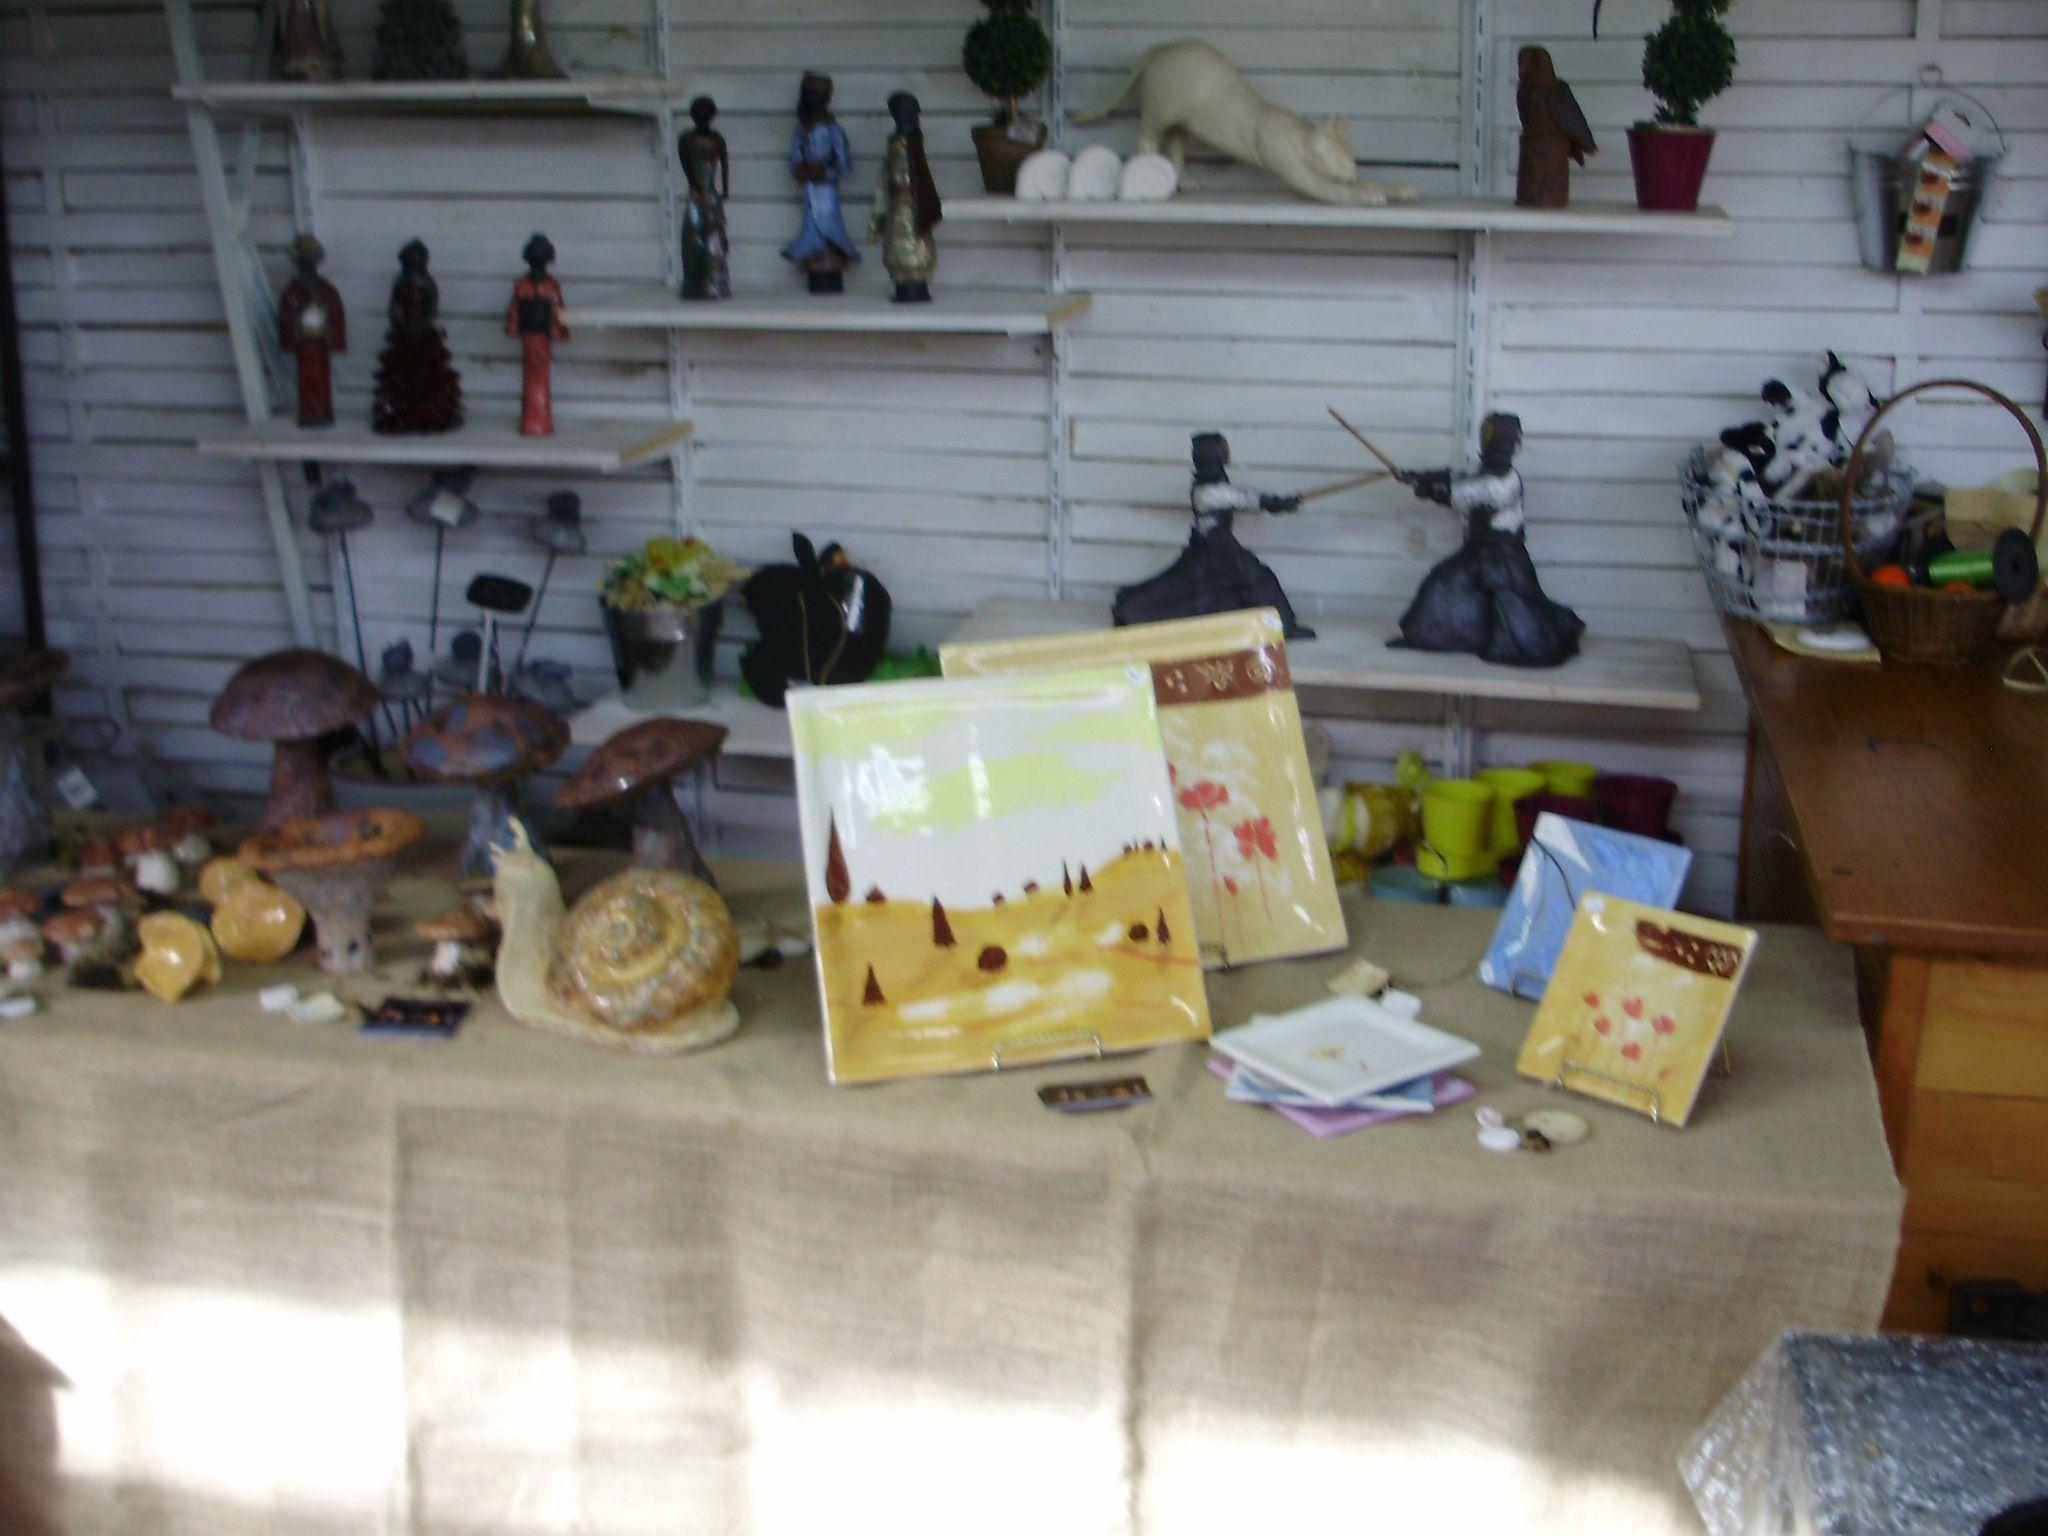 Deco Jardin Tournai | Tout Pour La Maison Tournai Petites Annonces